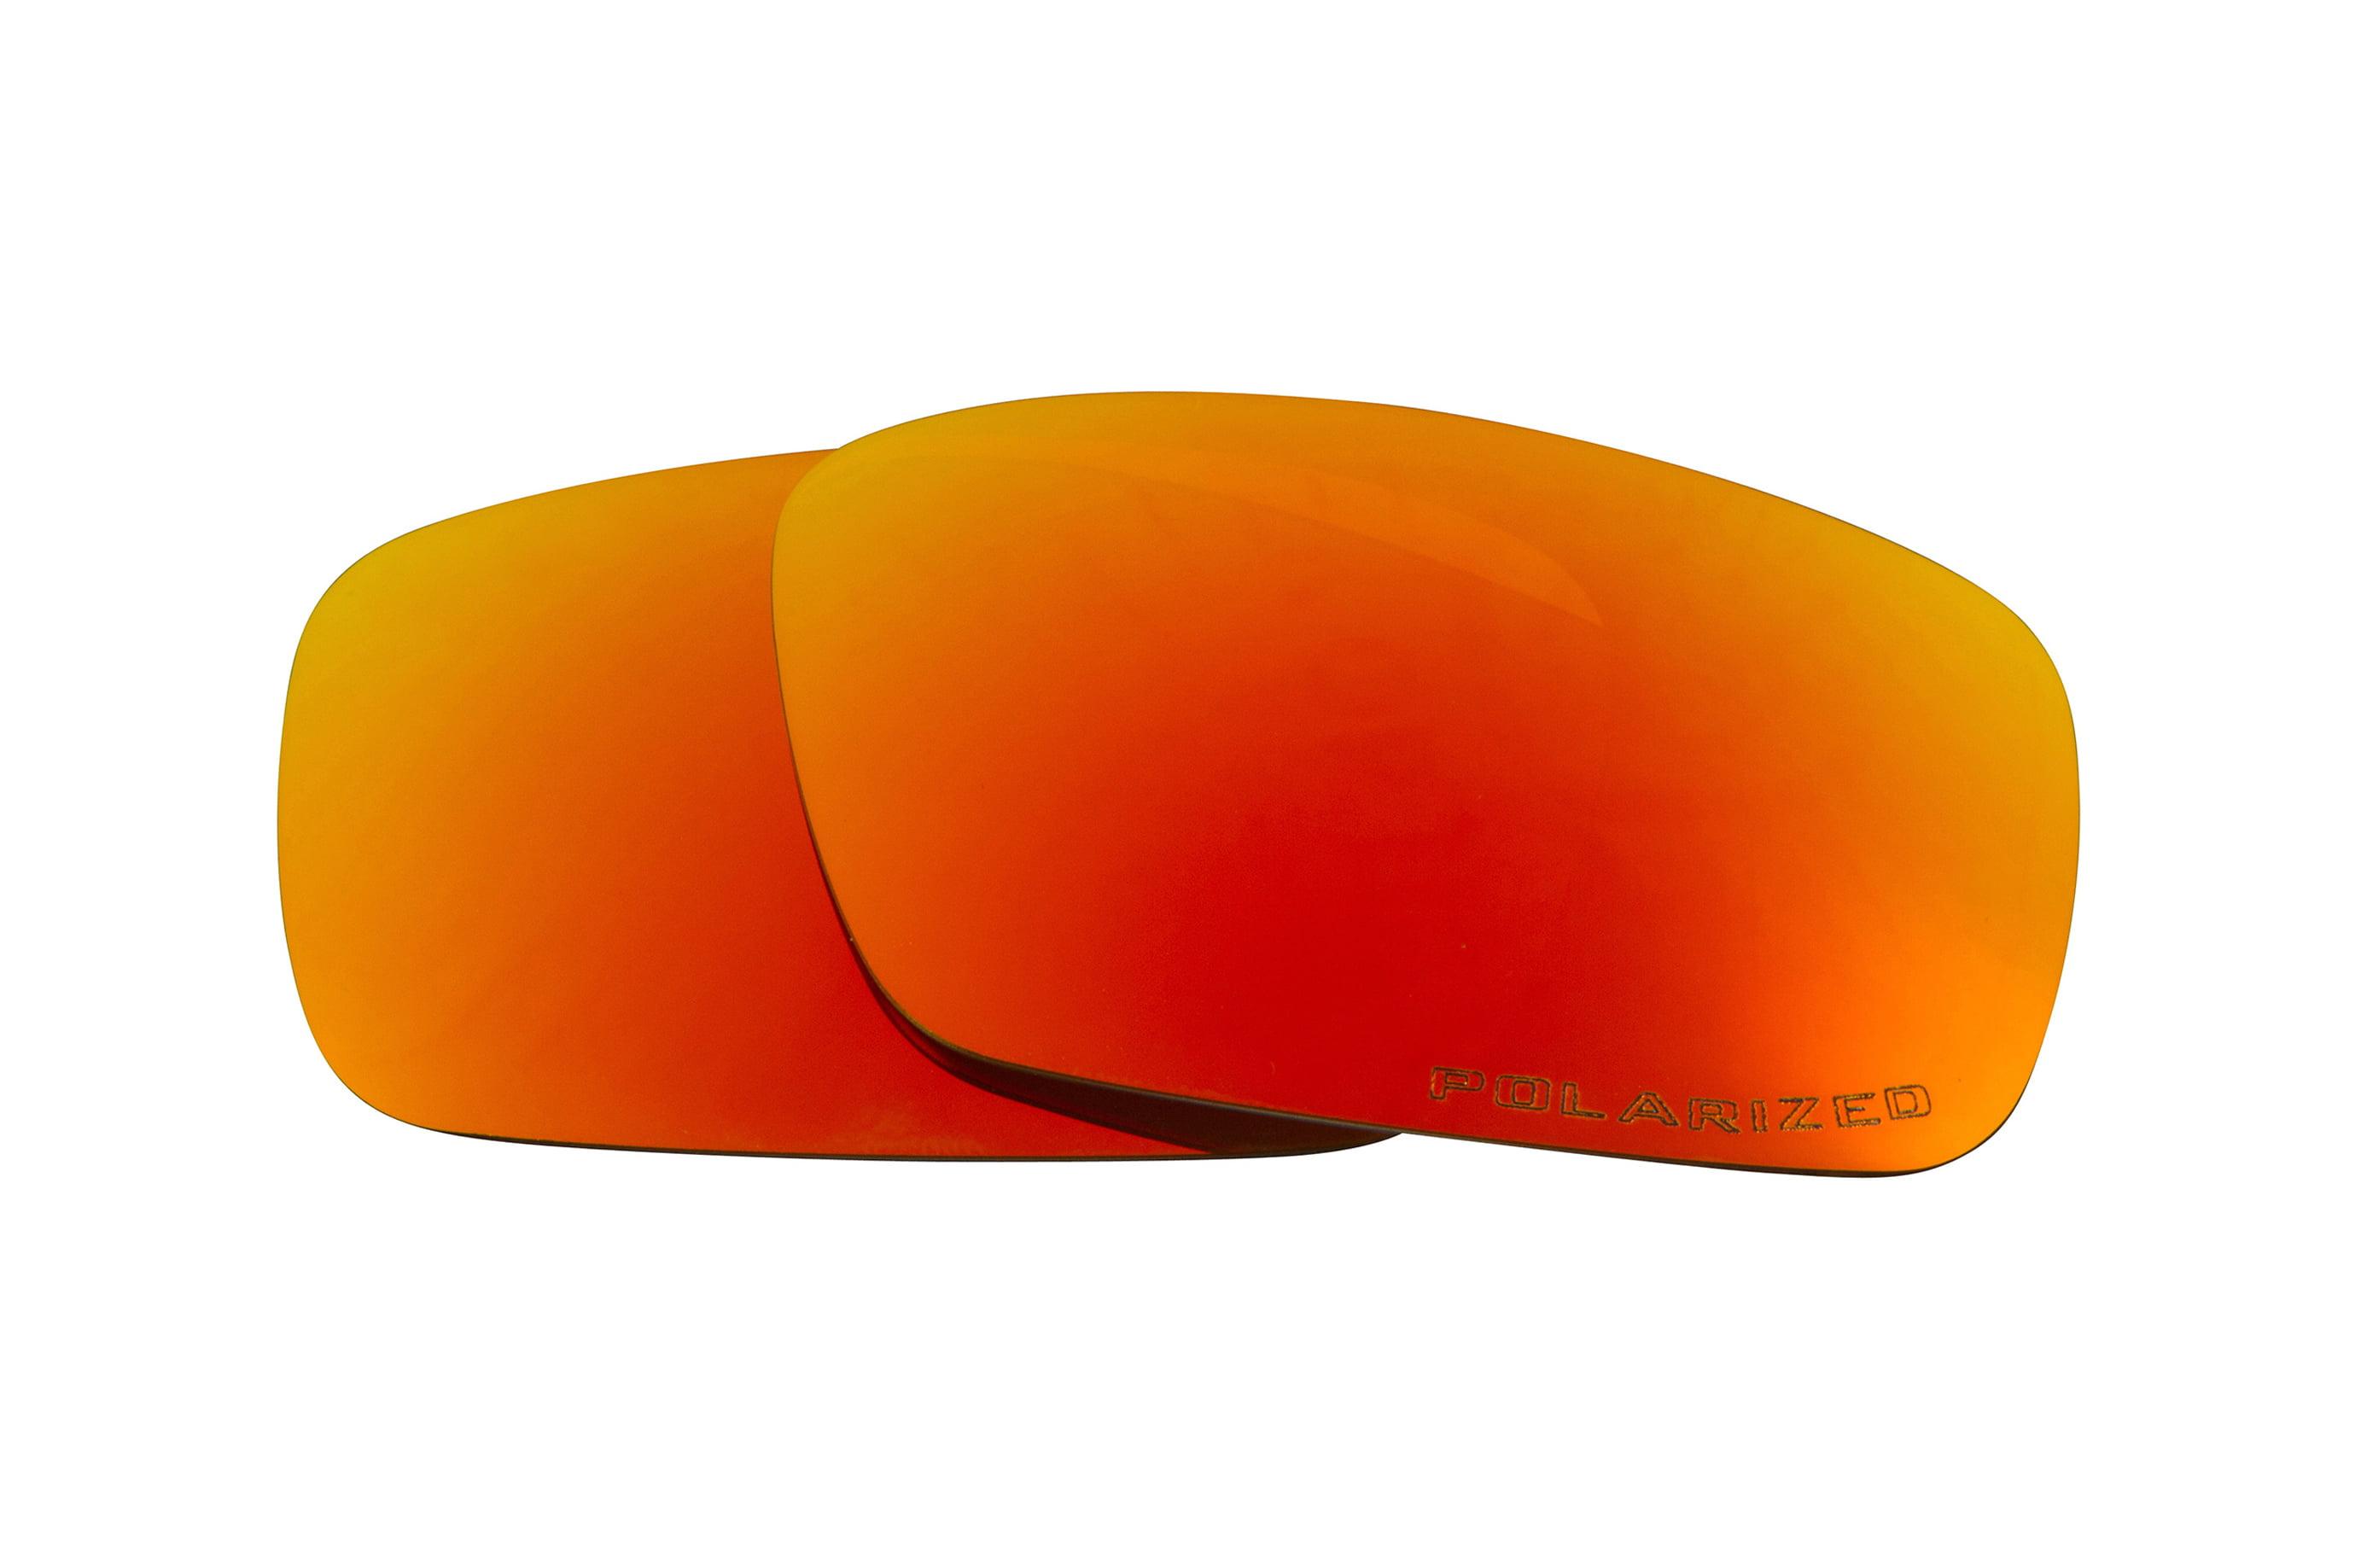 ebdad4d233 Seek Optics - Best SEEK OPTICS Replacement Lenses Compatible with ...